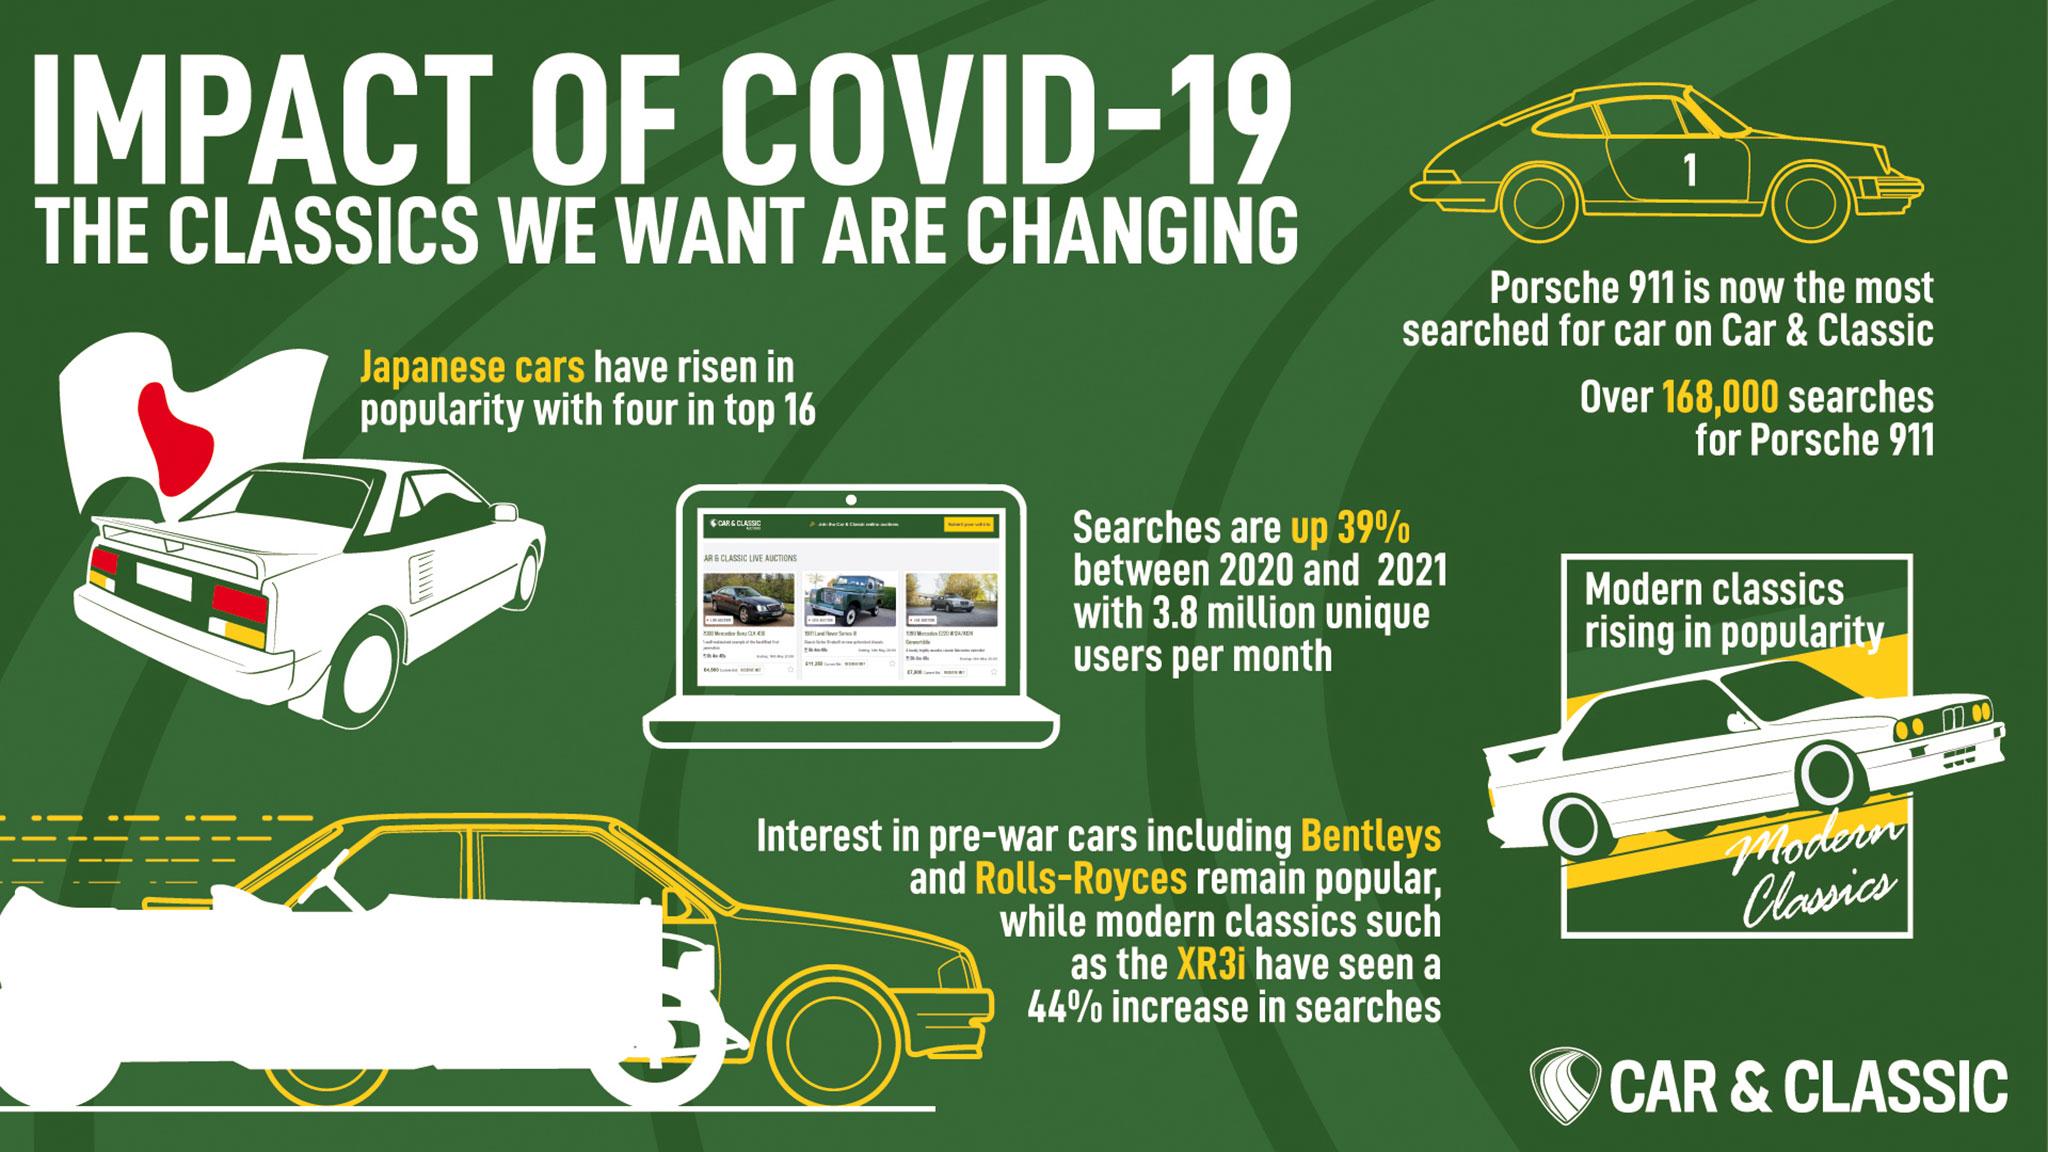 The impact of Covid 19 on classic car sales Car & Classic - Marché de la Collection.